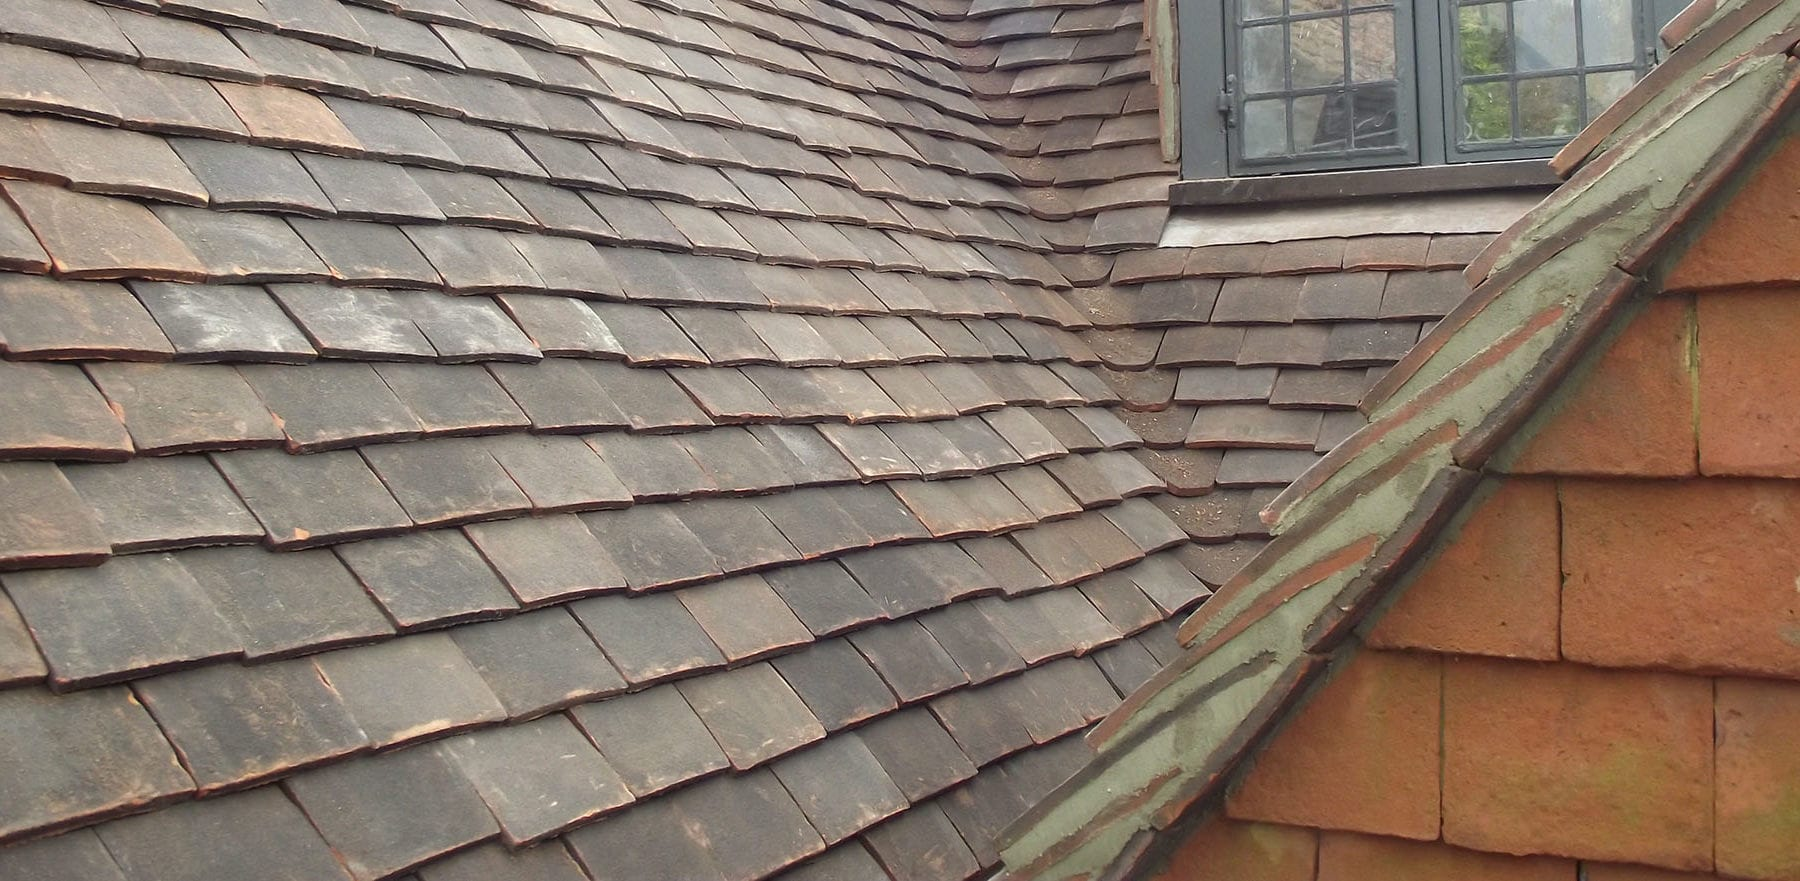 Lifestiles - Handmade Restoration Clay Roof Tiles - Dorking, England 3